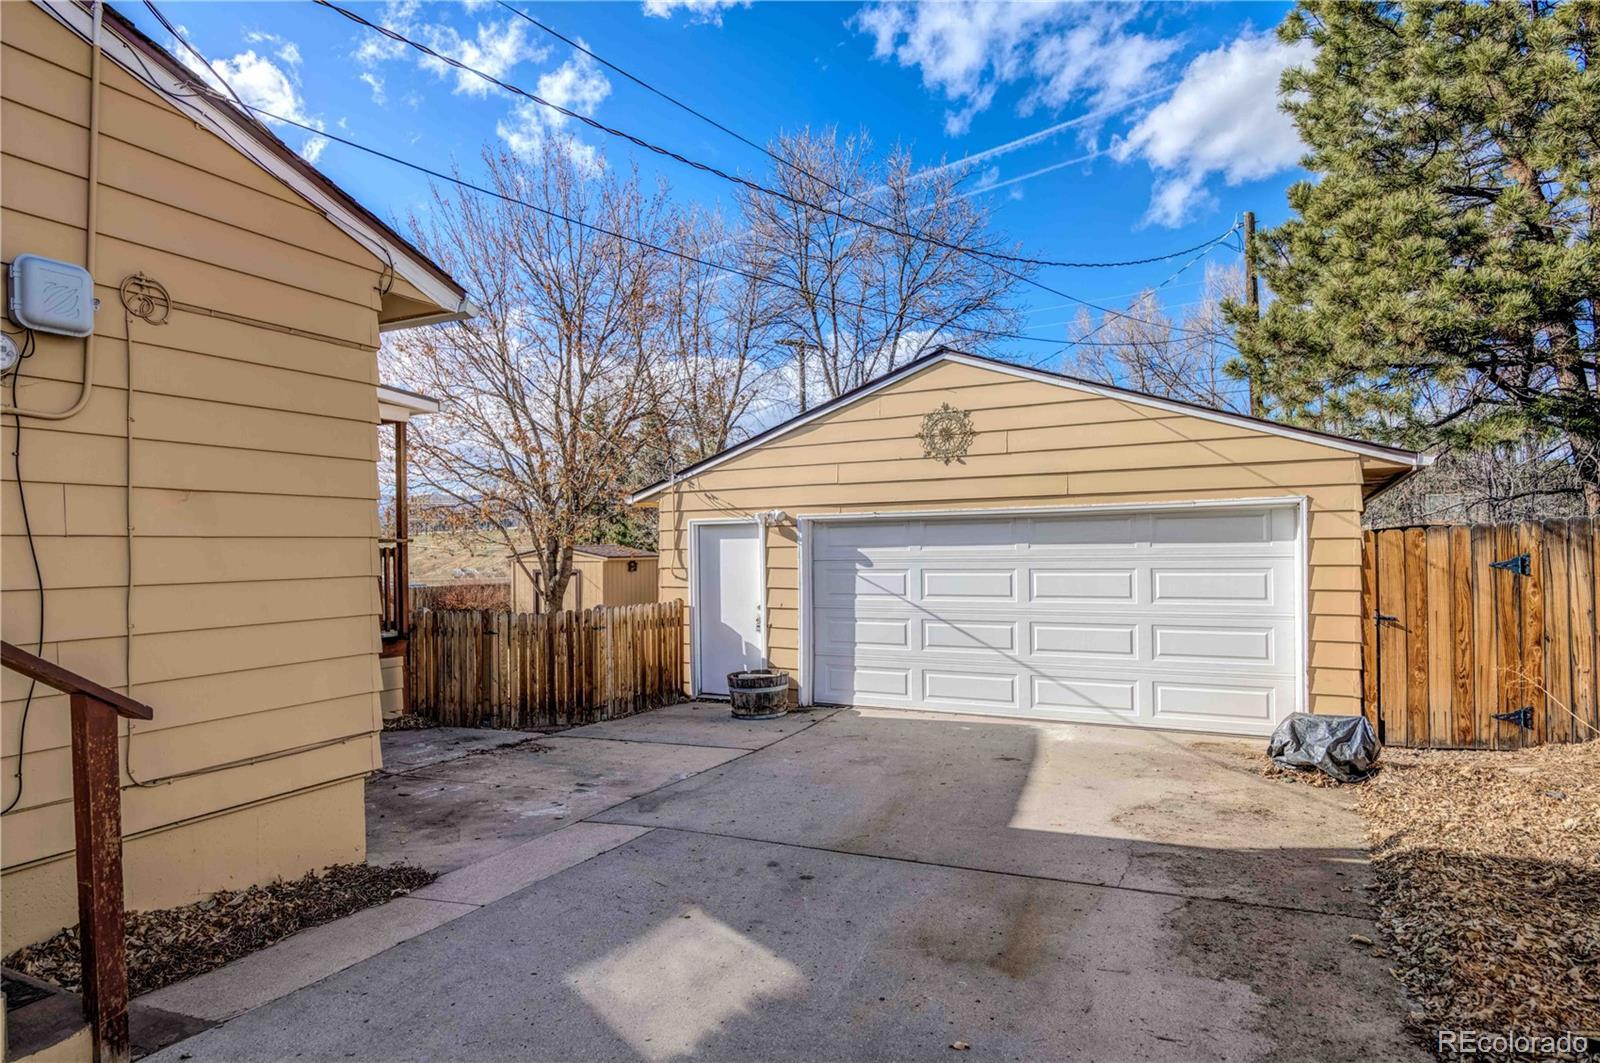 MLS# 5043109 - 27 - 1832 Northview Drive, Colorado Springs, CO 80909